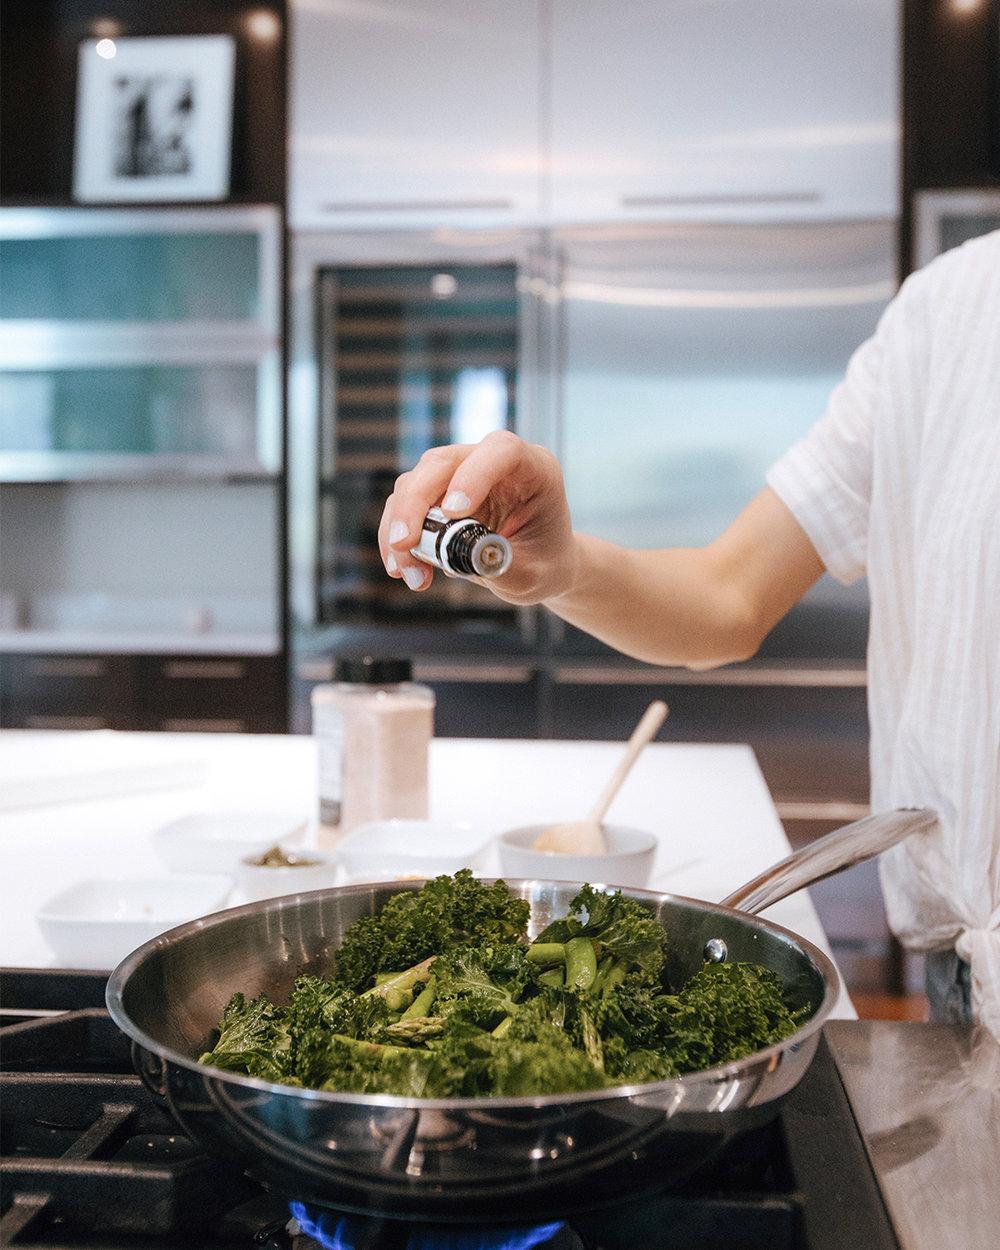 The-Oily-Home-Companion-Recipe-Pesto-penne-gluten-free-gf-pasta-spring-vegetables-asparagus-kale-garlic-basil-lemon-vitality-essential-oil-pesto-Summer-Spring-Dish-Meal-Prep.jpg